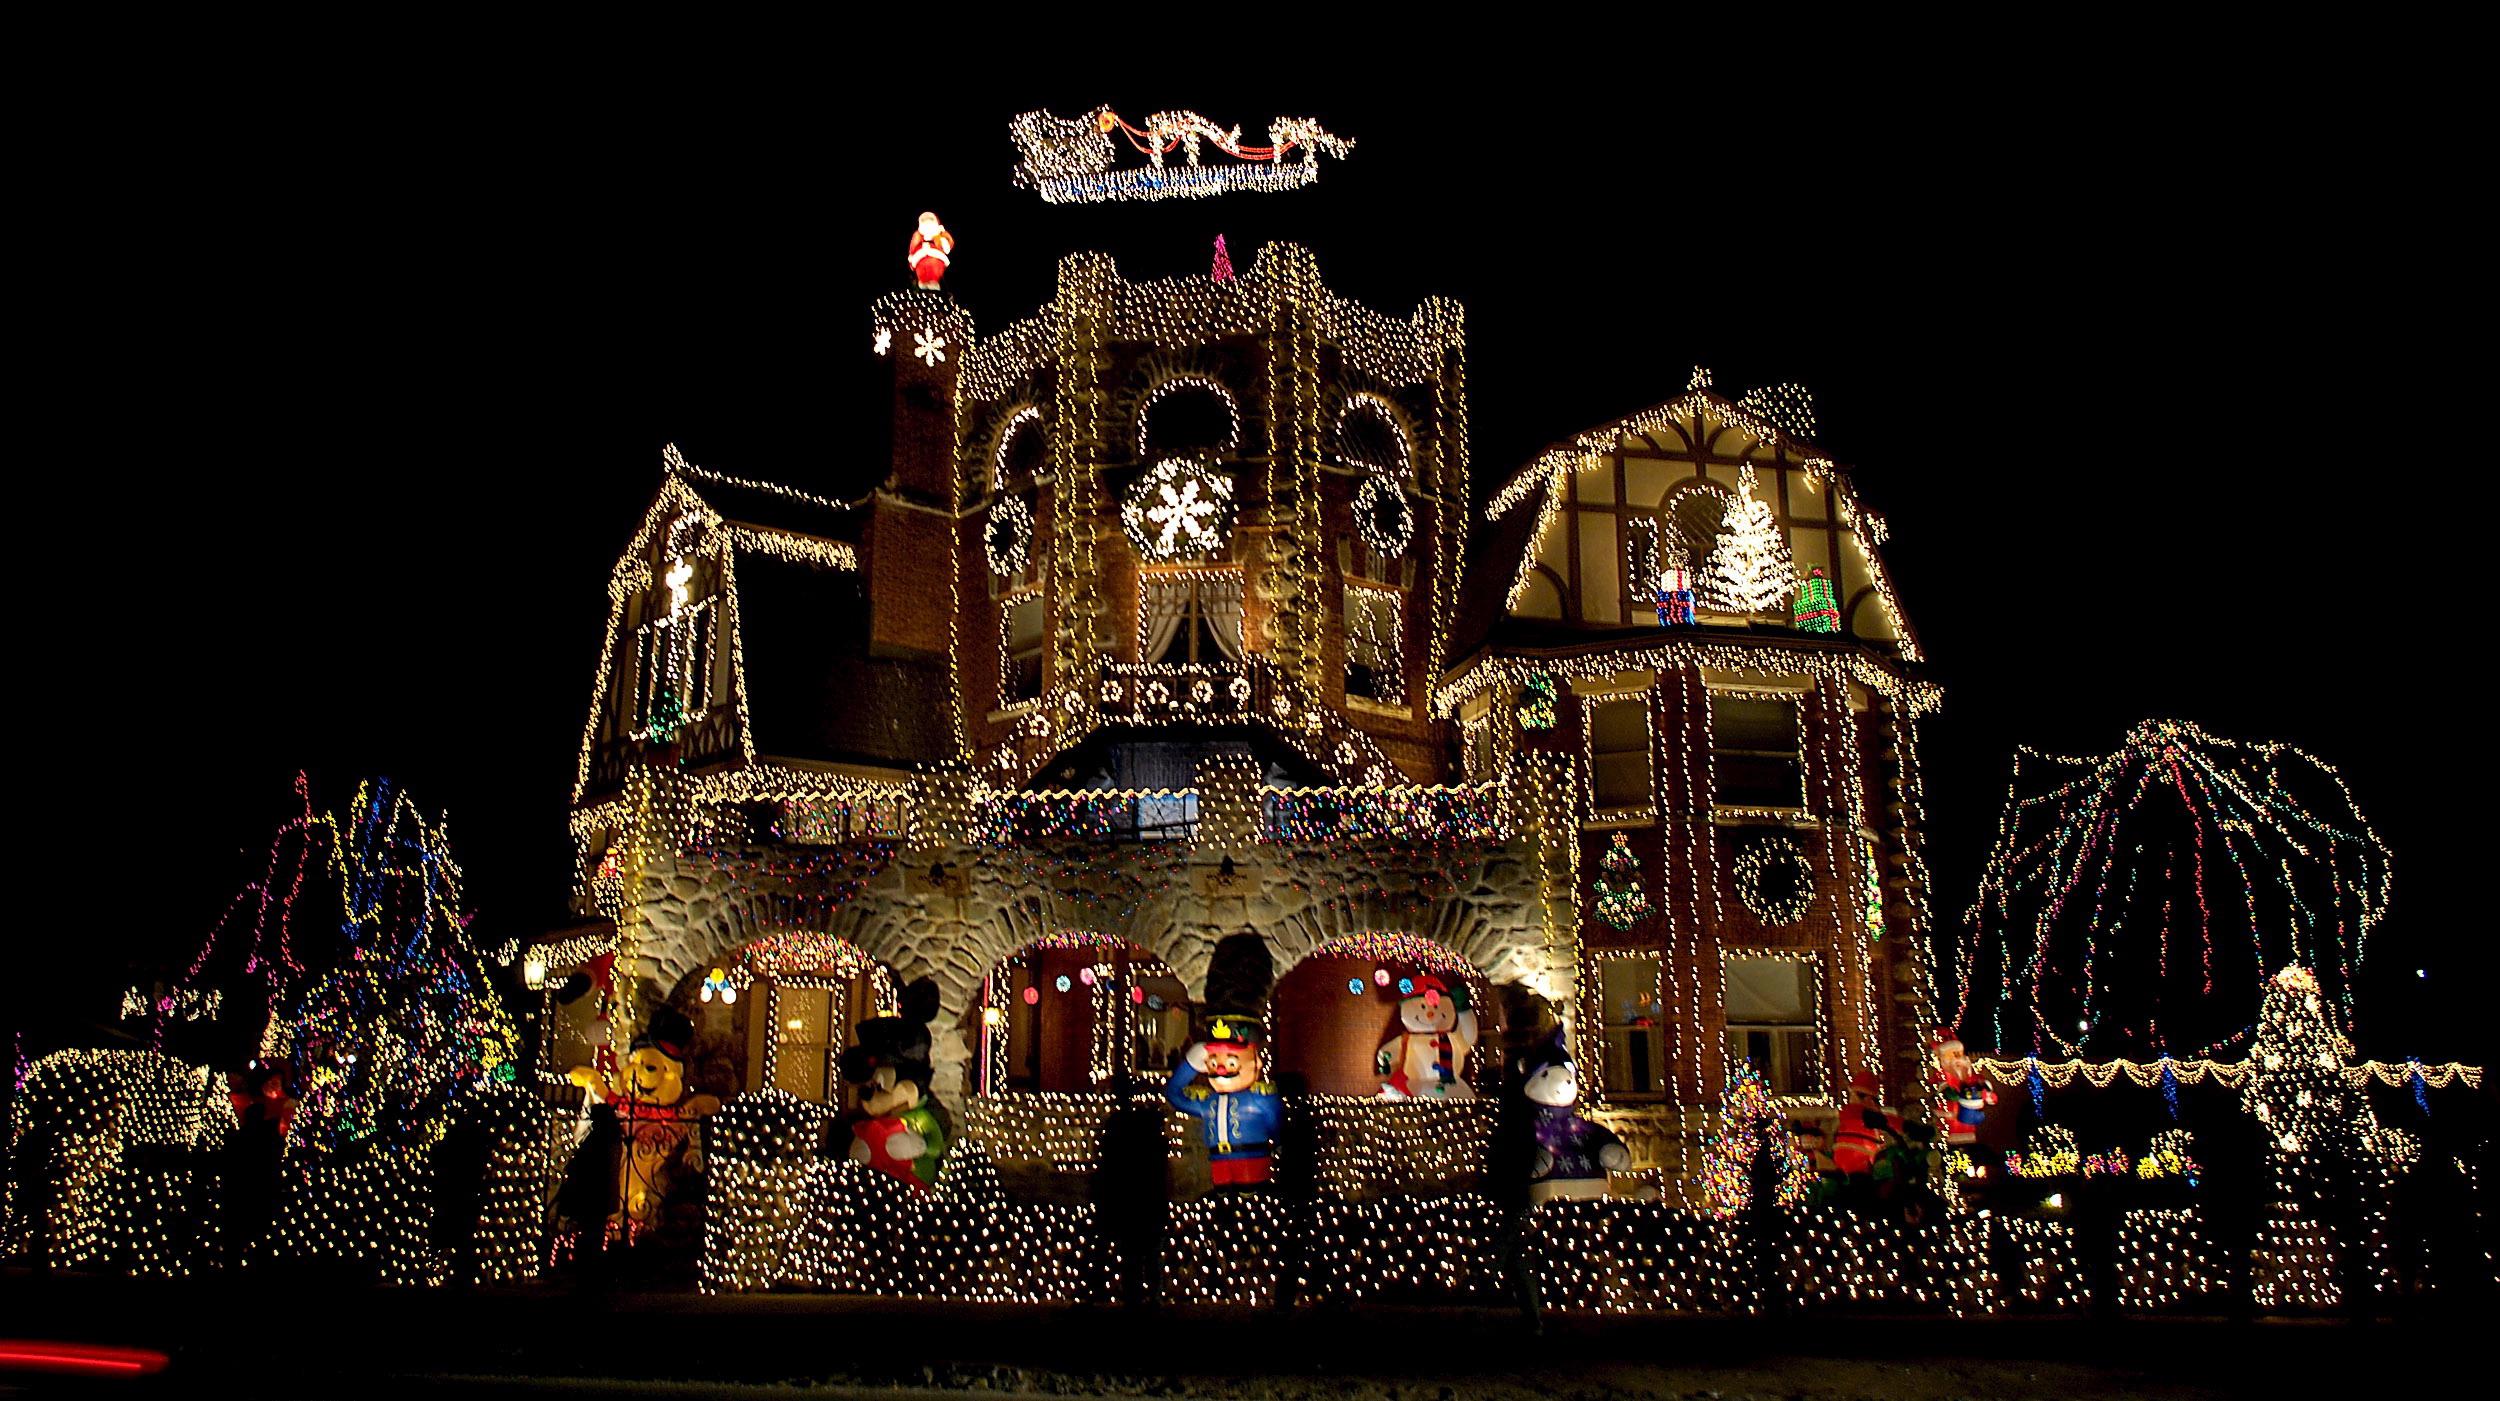 boston massachusetts dominic luberto christmas lights christmas decorations holidays - Newest Christmas Lights